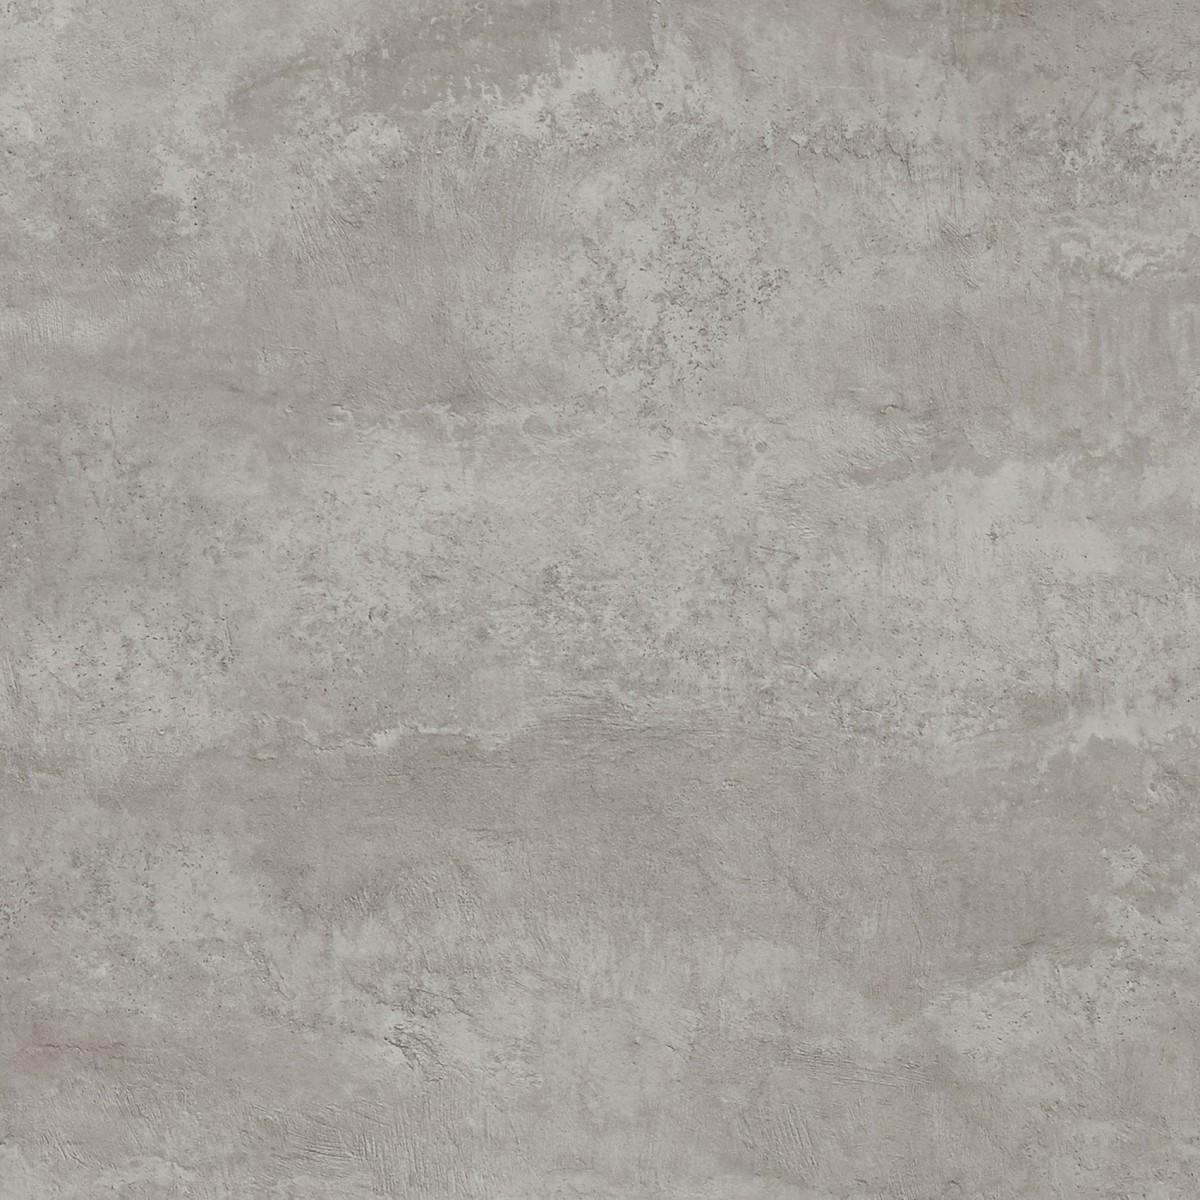 Столешница S529 Асканит 1U 28 3050 600